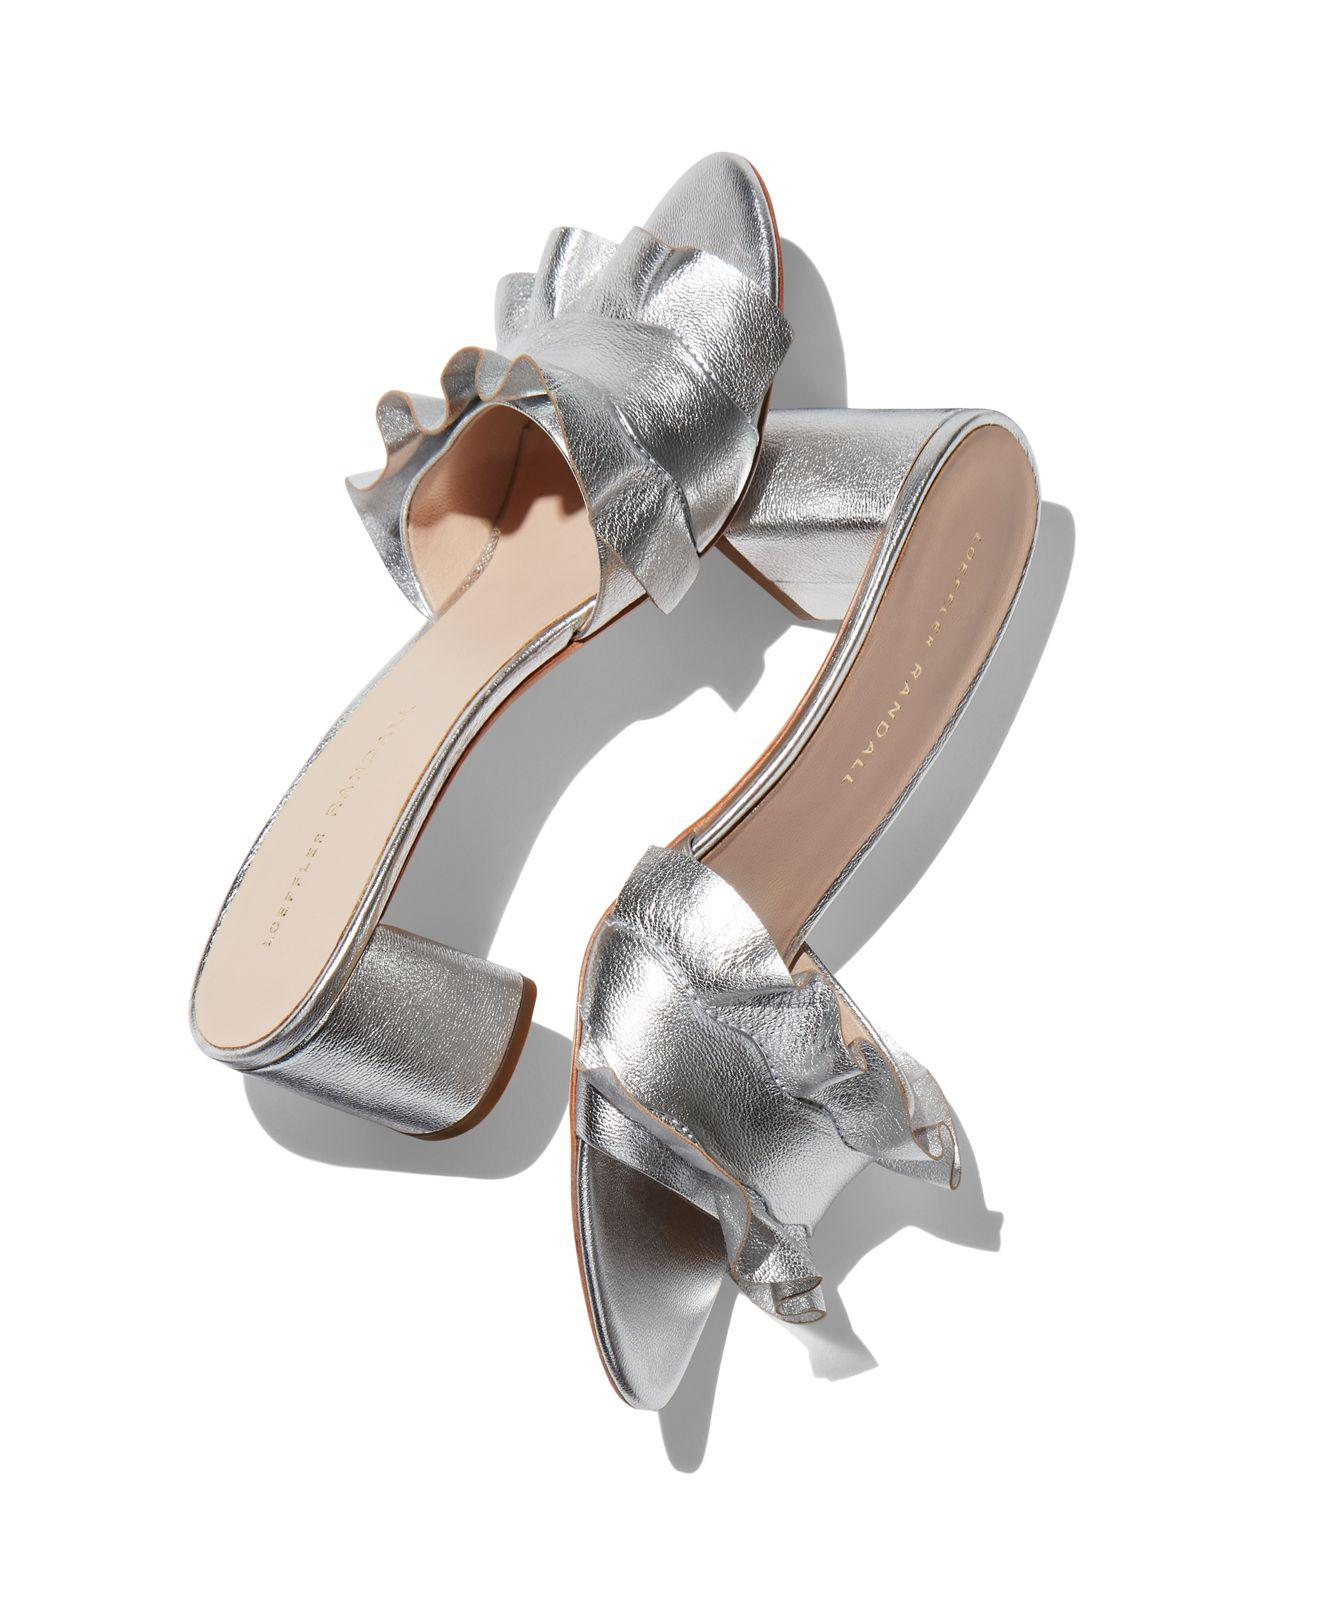 b4575a546b2 Lyst - Loeffler Randall Vera Metallic Leather Block Heel Slide ...